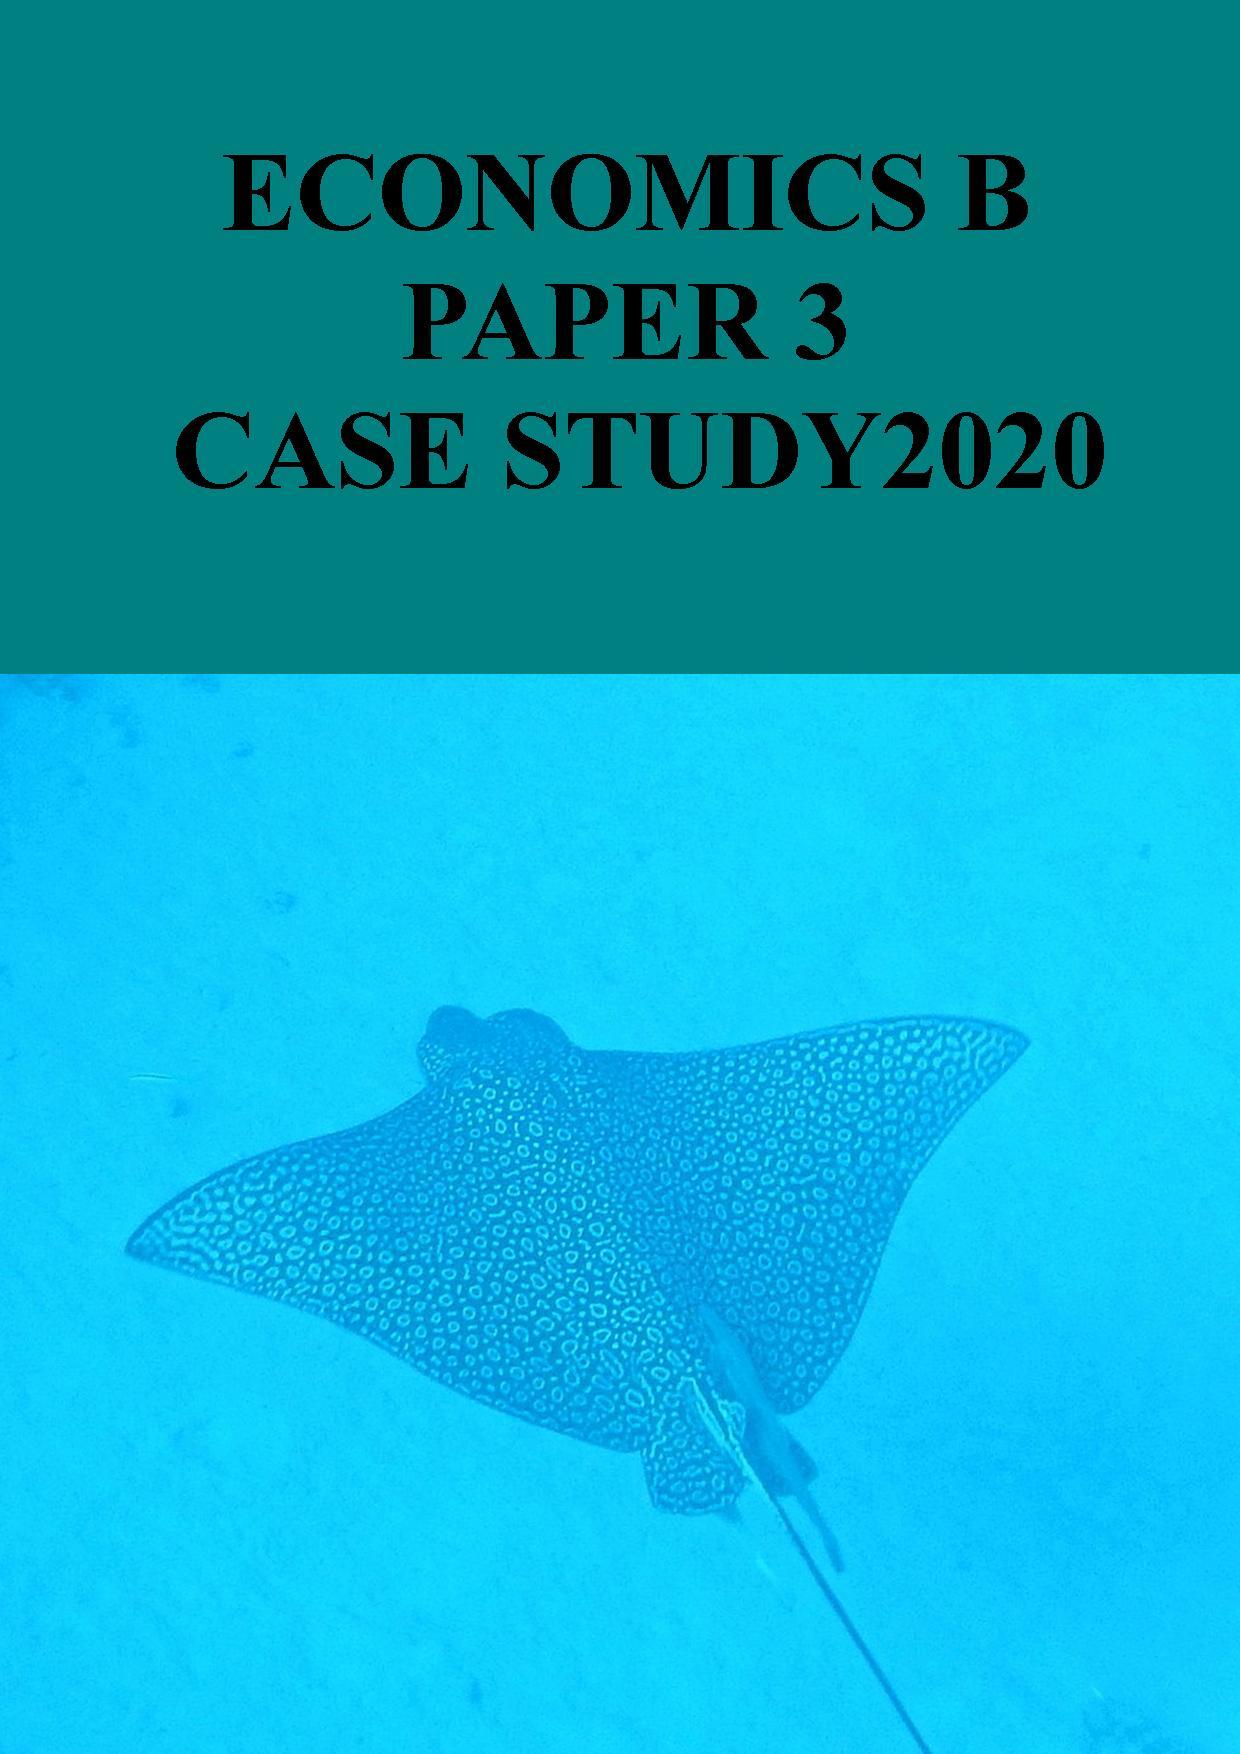 Paper 3 Case Study - 2020